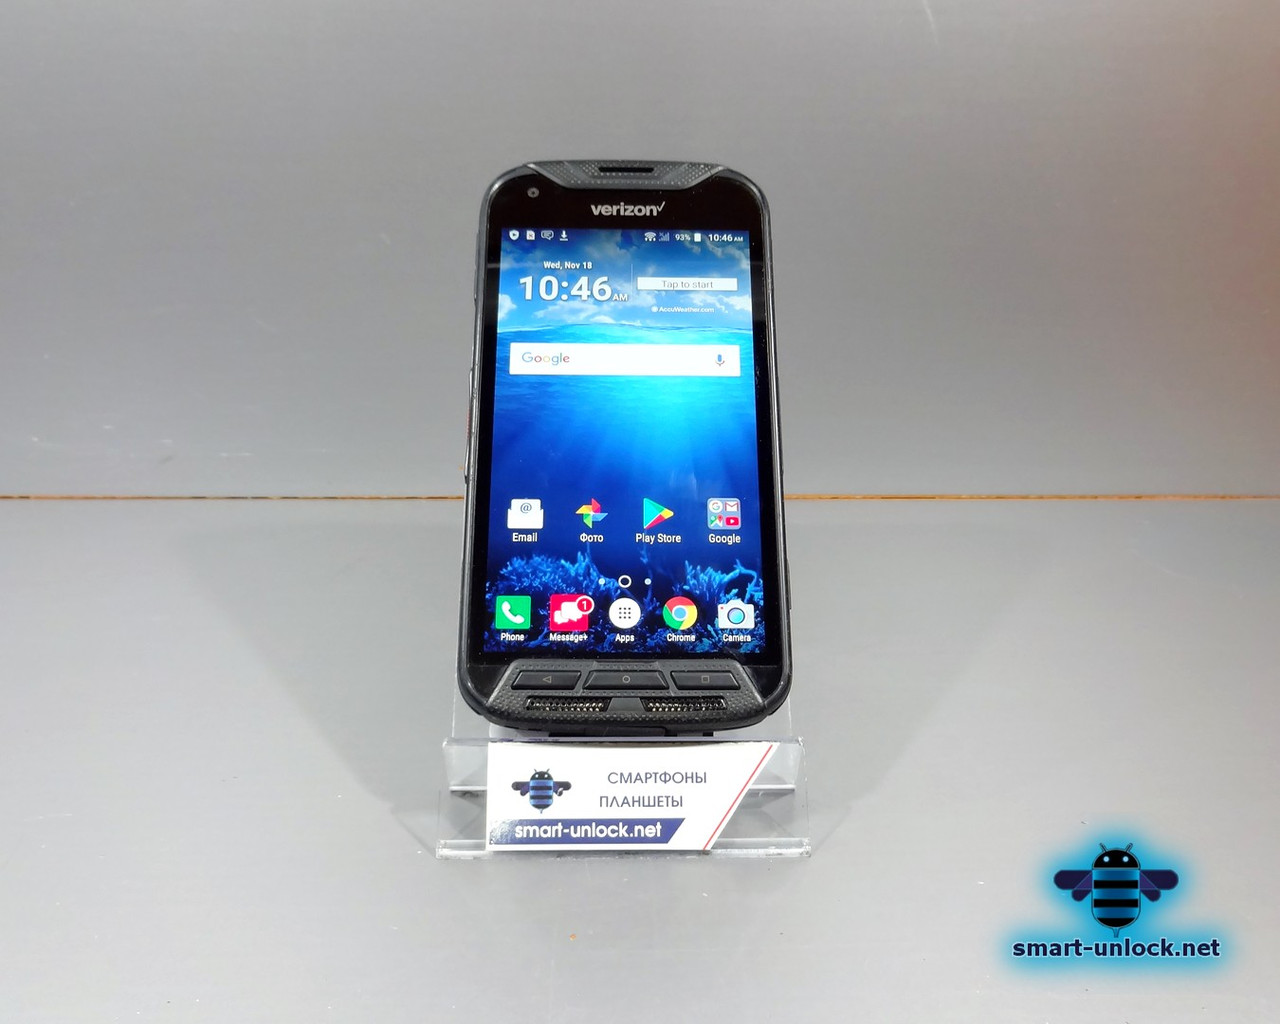 Телефон, смартфон Kyocera DuraForce Pro 3Gb RAM. Покупка без риска, гарантия!